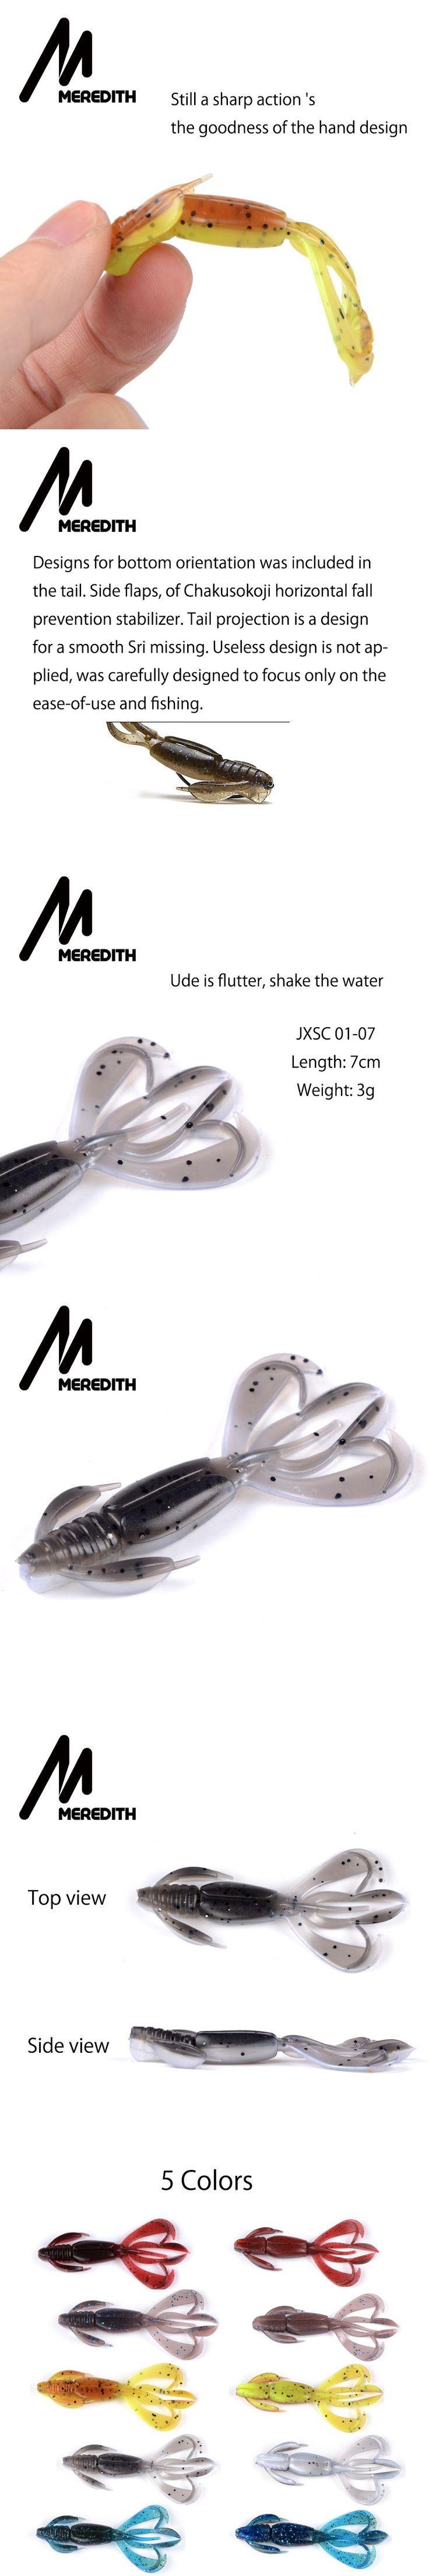 MEREDITH Fishing Lures Crazy Flapper 70mm/3g 10pc/Lot Craws Soft Lures Fishing For Fishing Soft Bait Shrimp Bass Bait Peche Gear